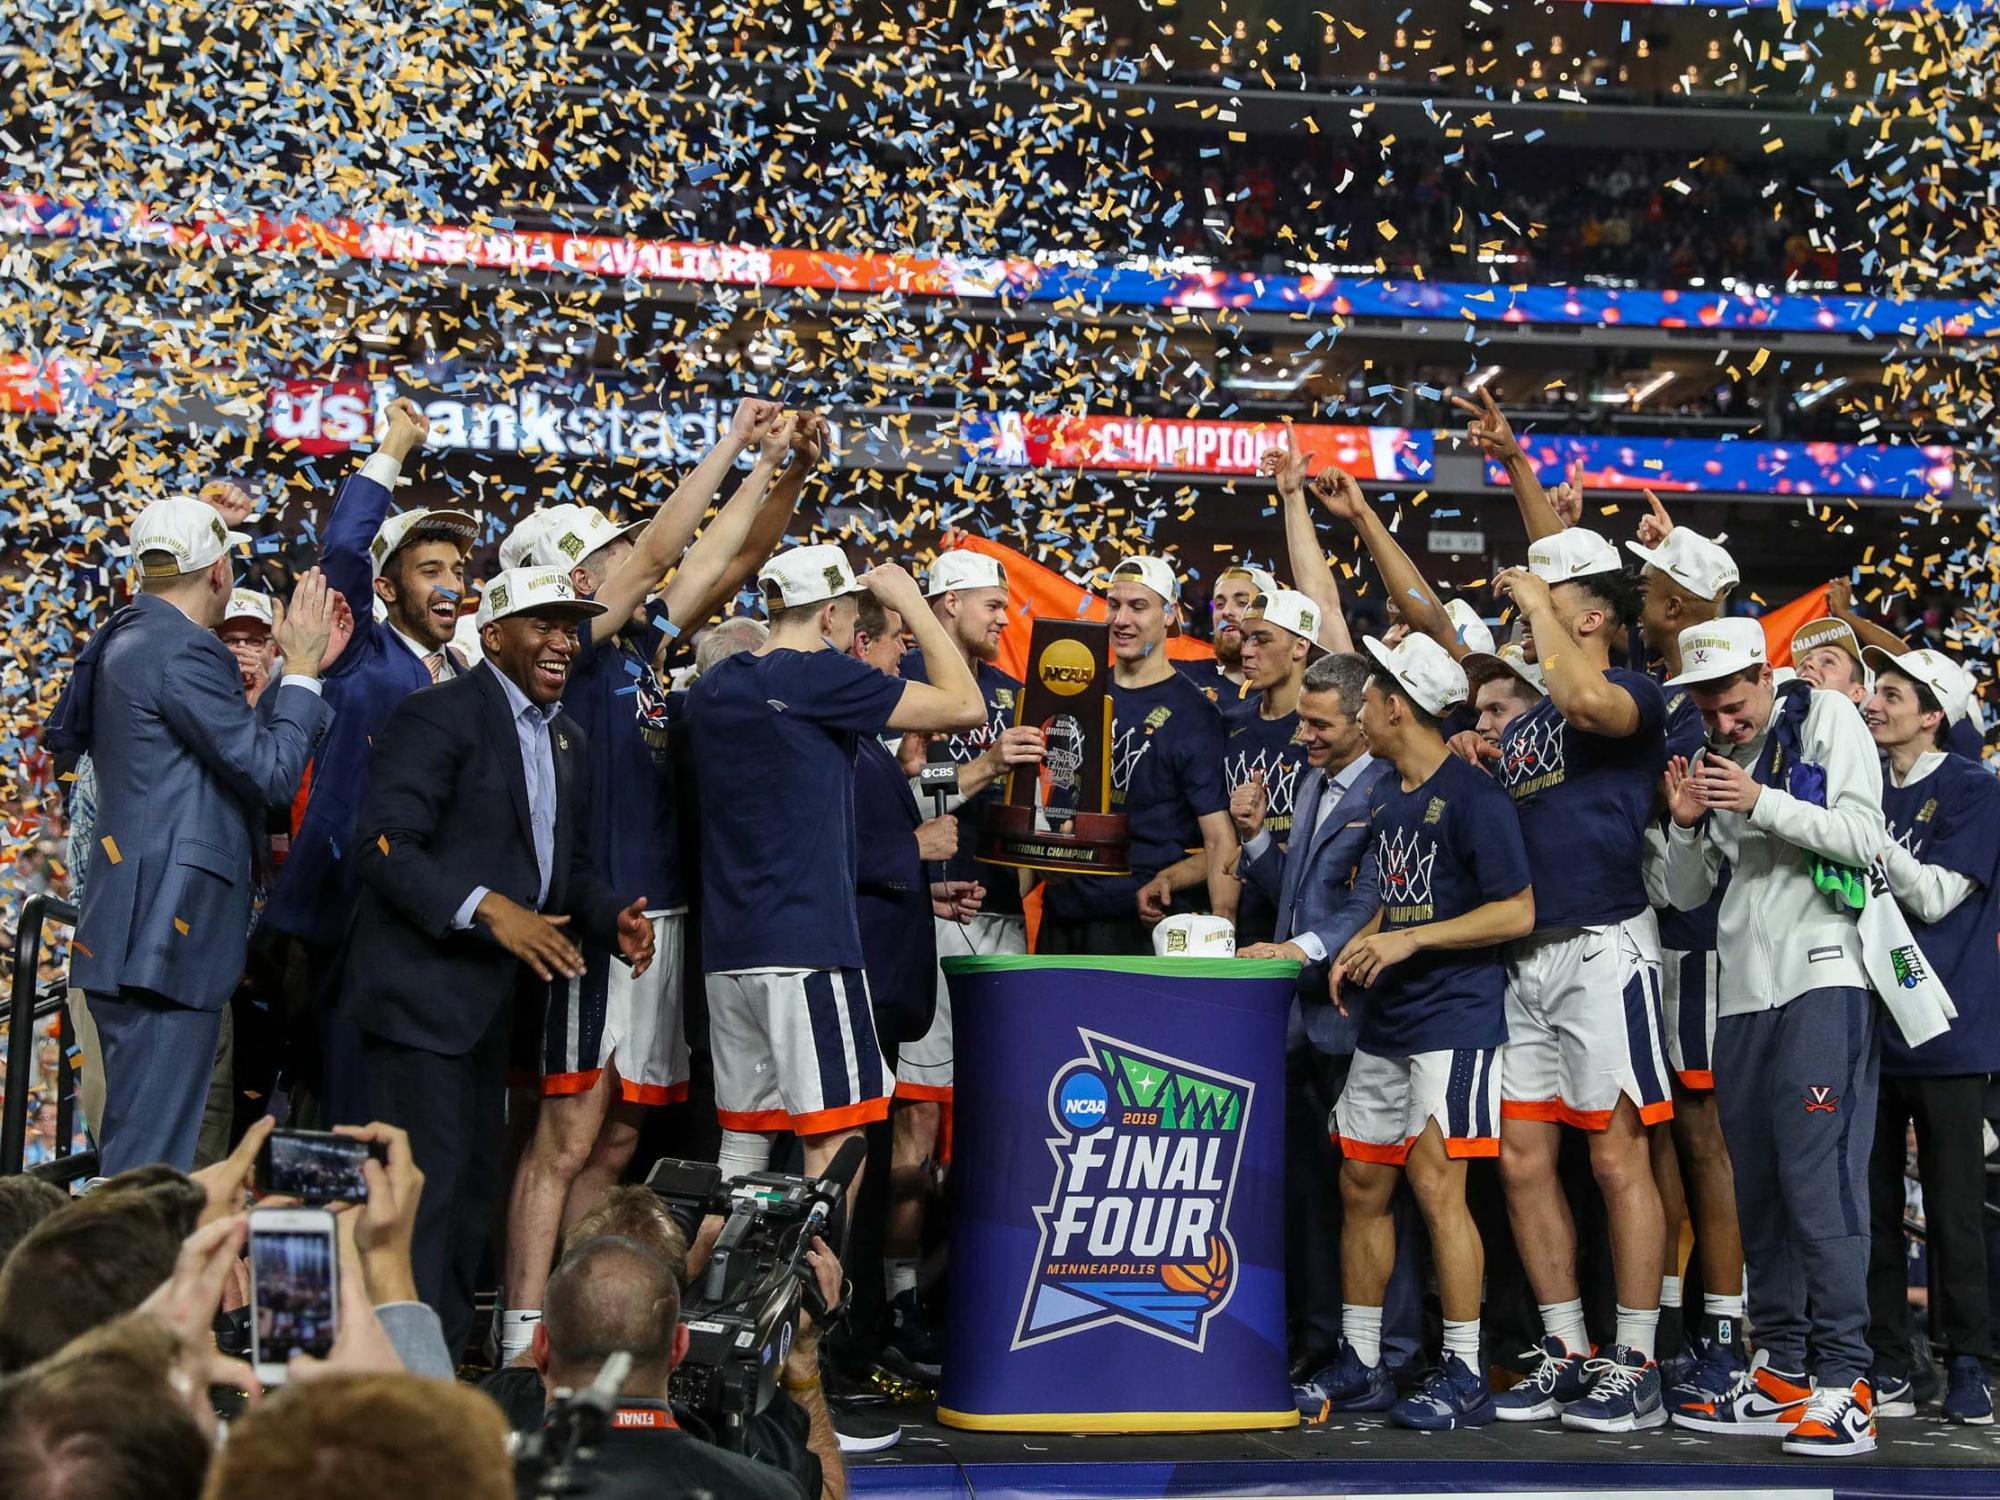 UVA Wins 2019 NCAA Men's Basketball Championship | UVA Today